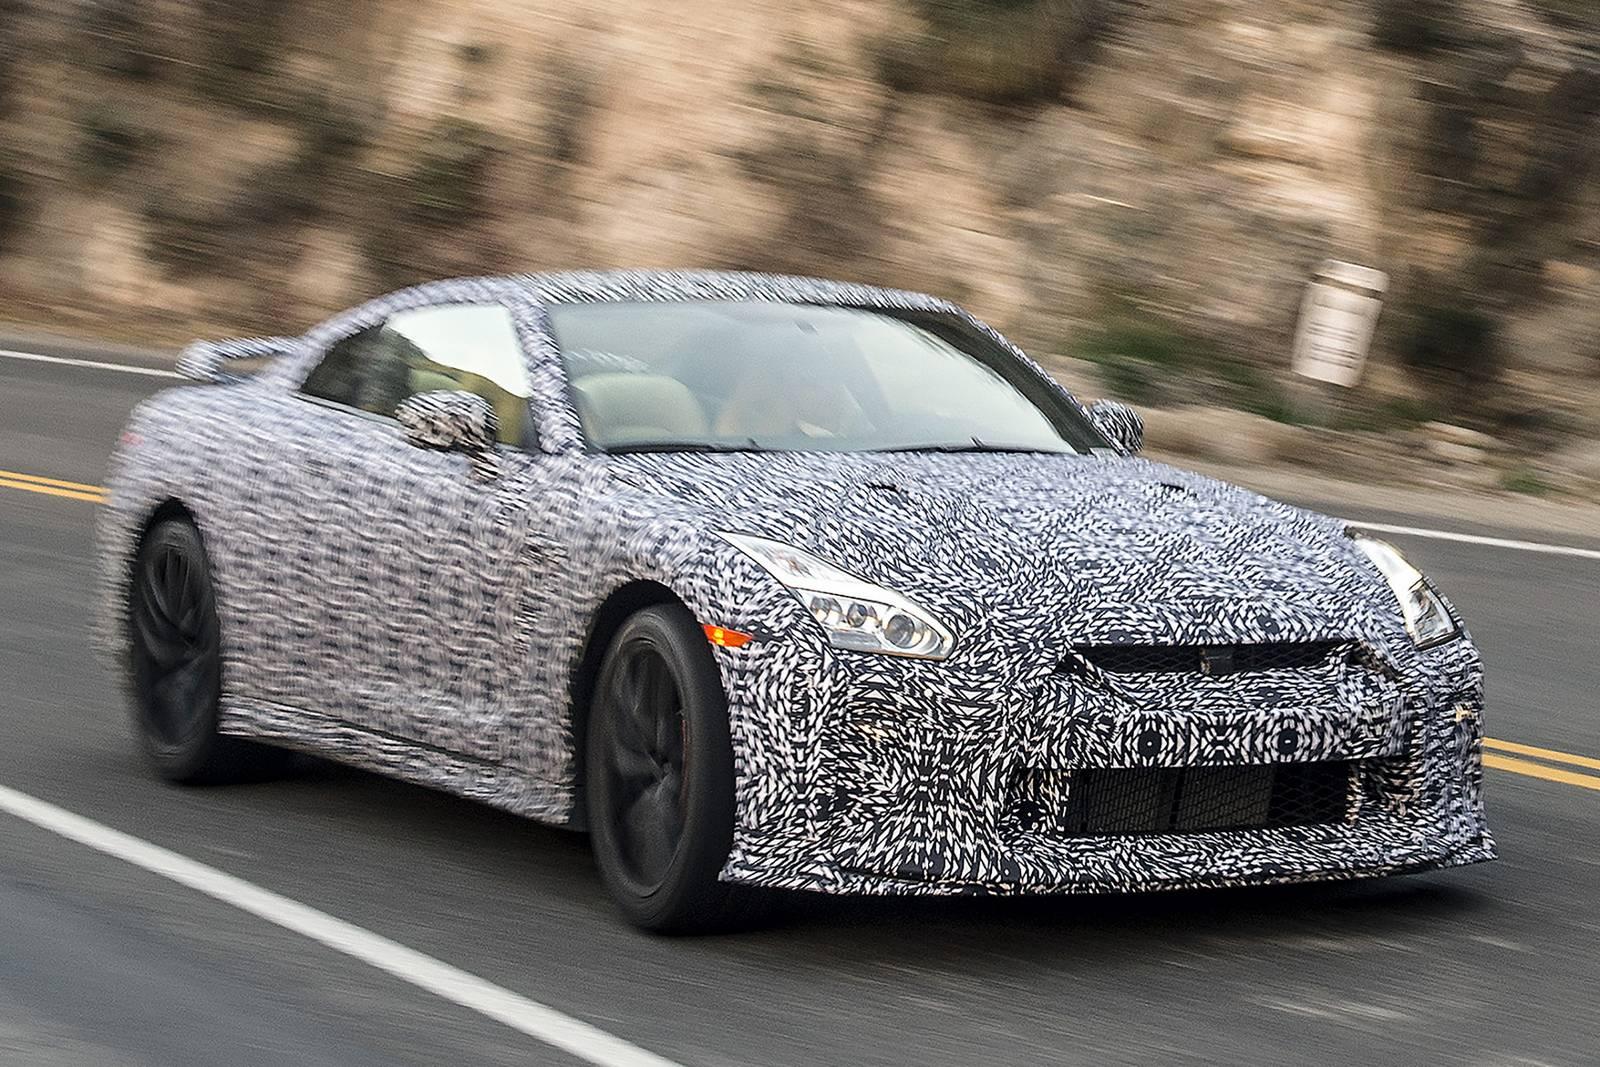 2017 Nissan GTR Spy shots